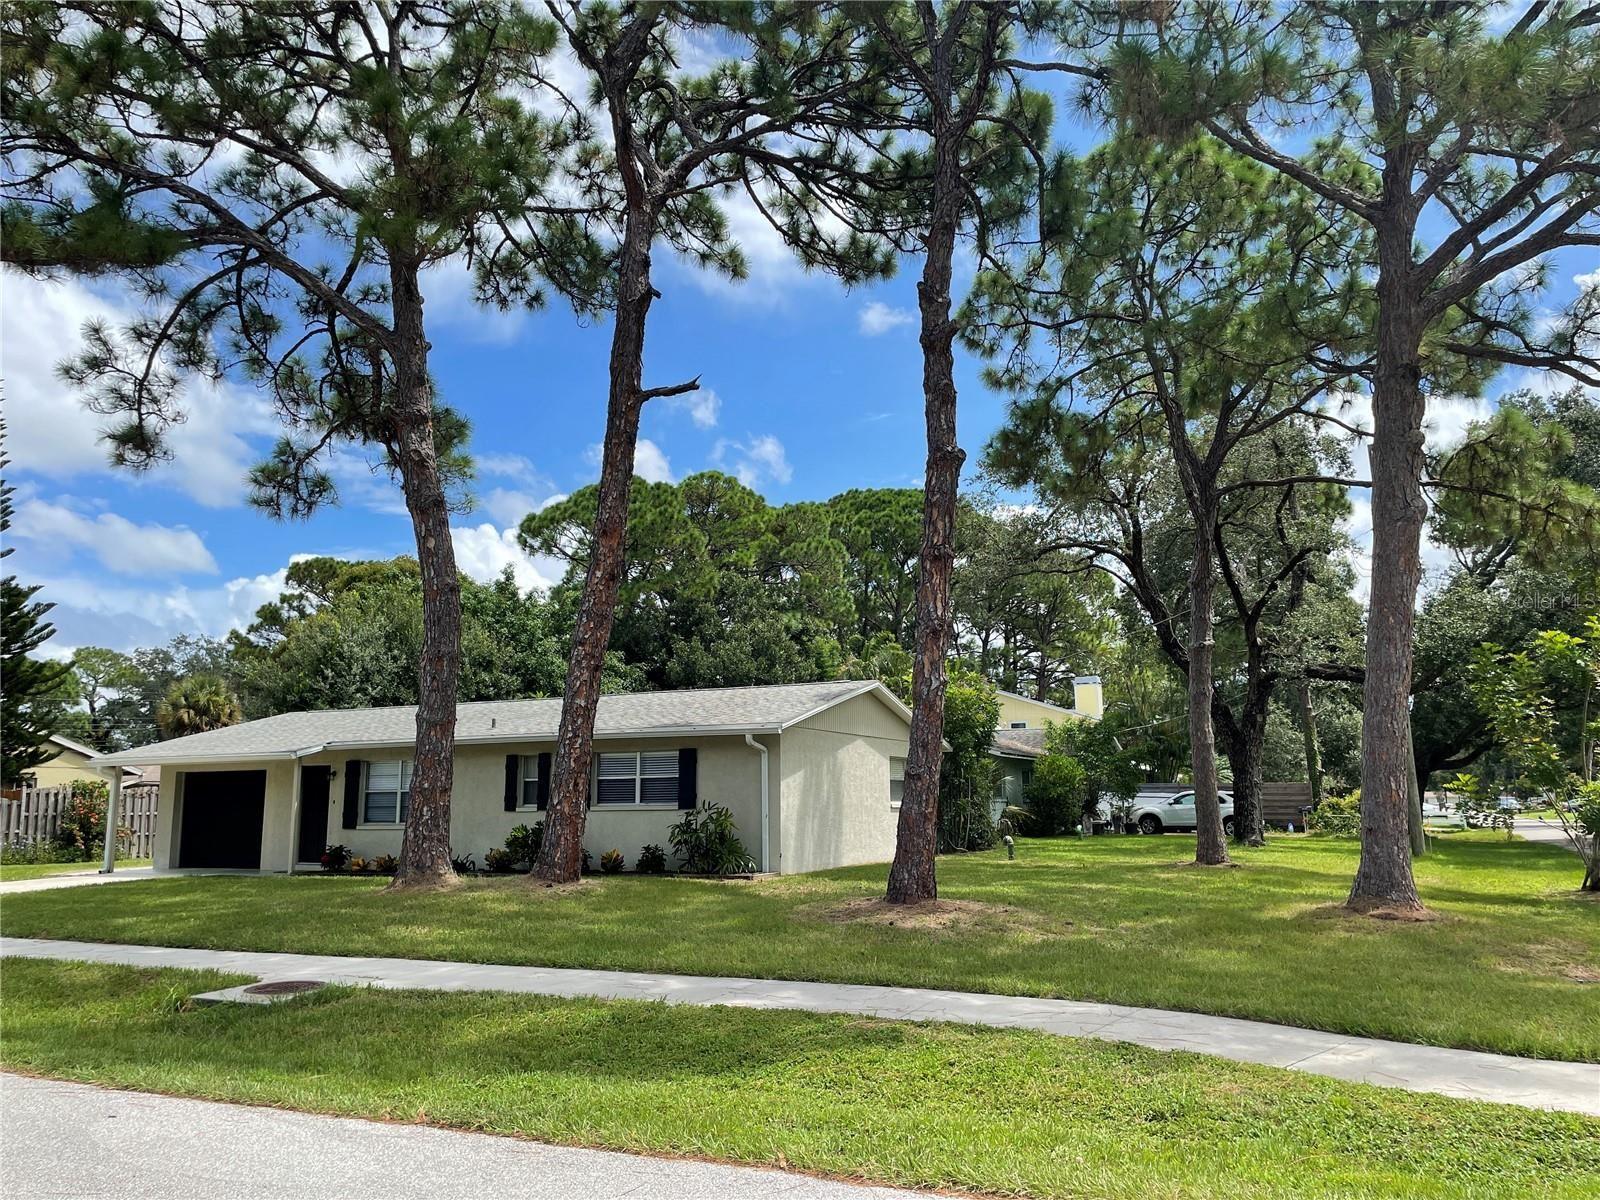 Photo of 2055 FAIRFIELD AVENUE, SARASOTA, FL 34232 (MLS # A4510594)